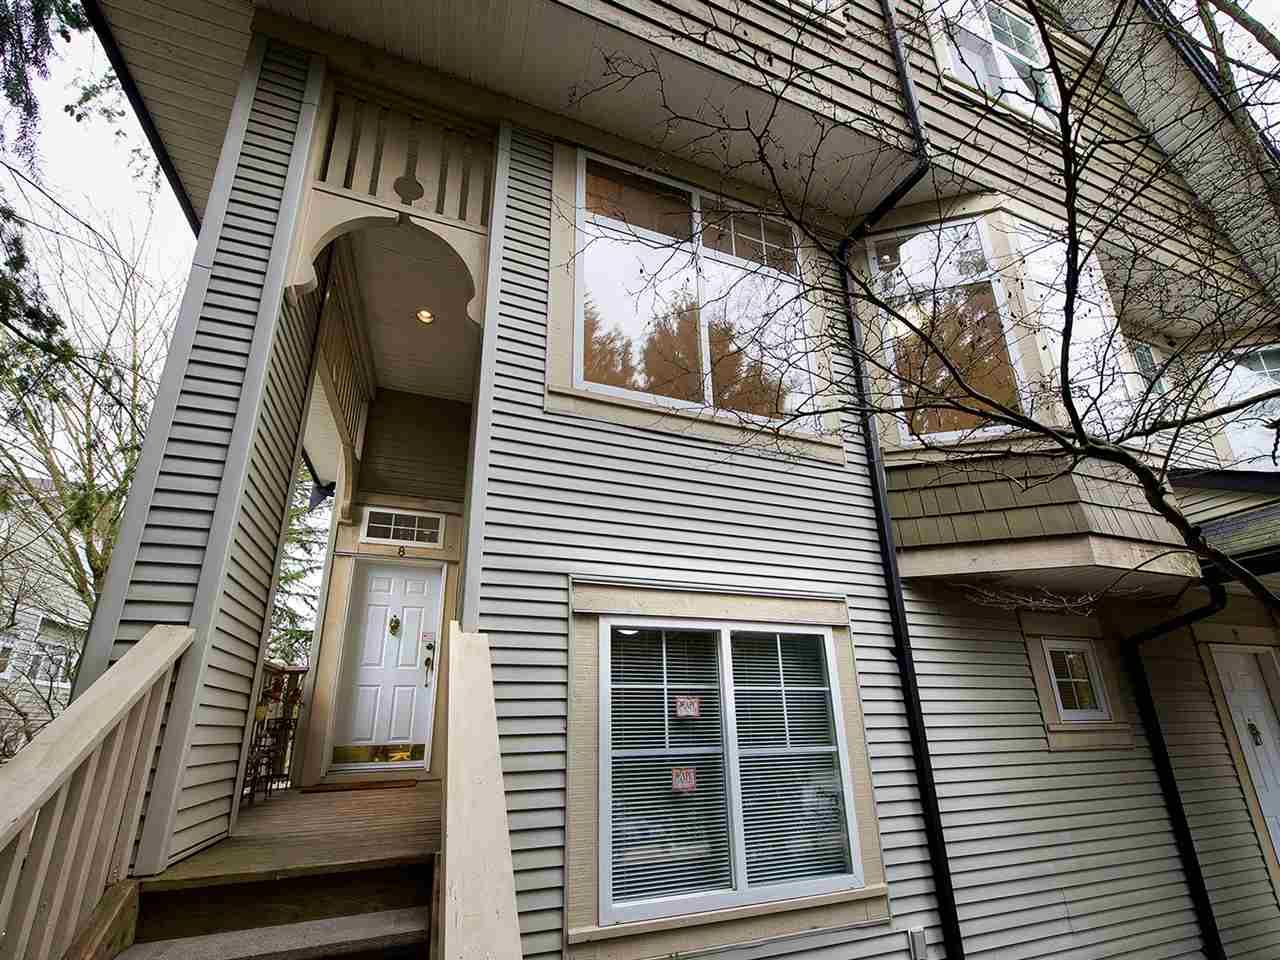 "Main Photo: 8 3711 ROBSON Court in Richmond: Terra Nova Townhouse for sale in ""TENNYSON GARDENS"" : MLS®# R2135040"